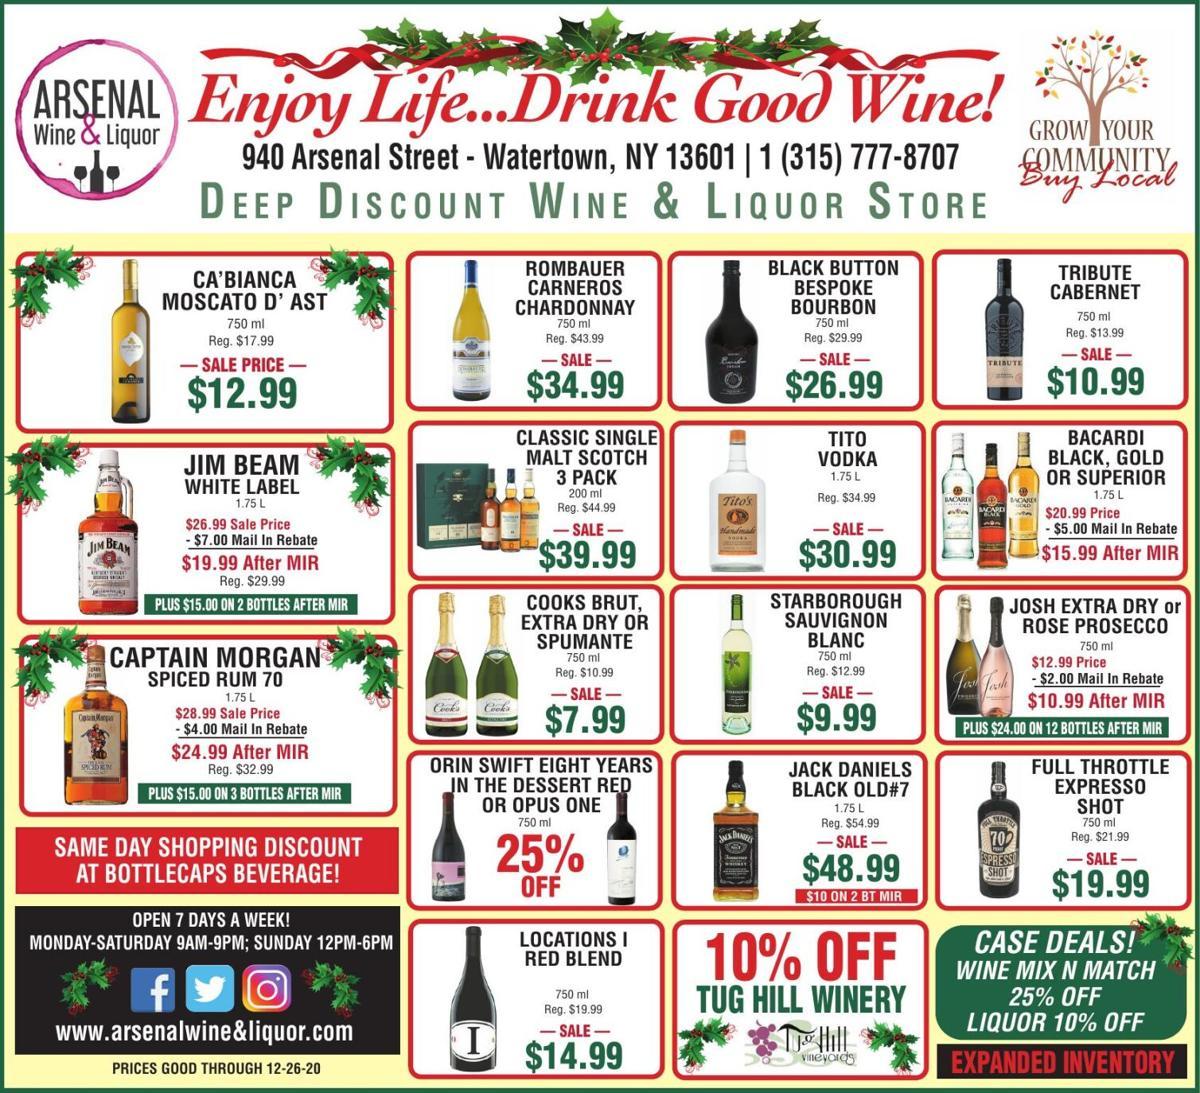 Arsenal St. Wine and Liquor